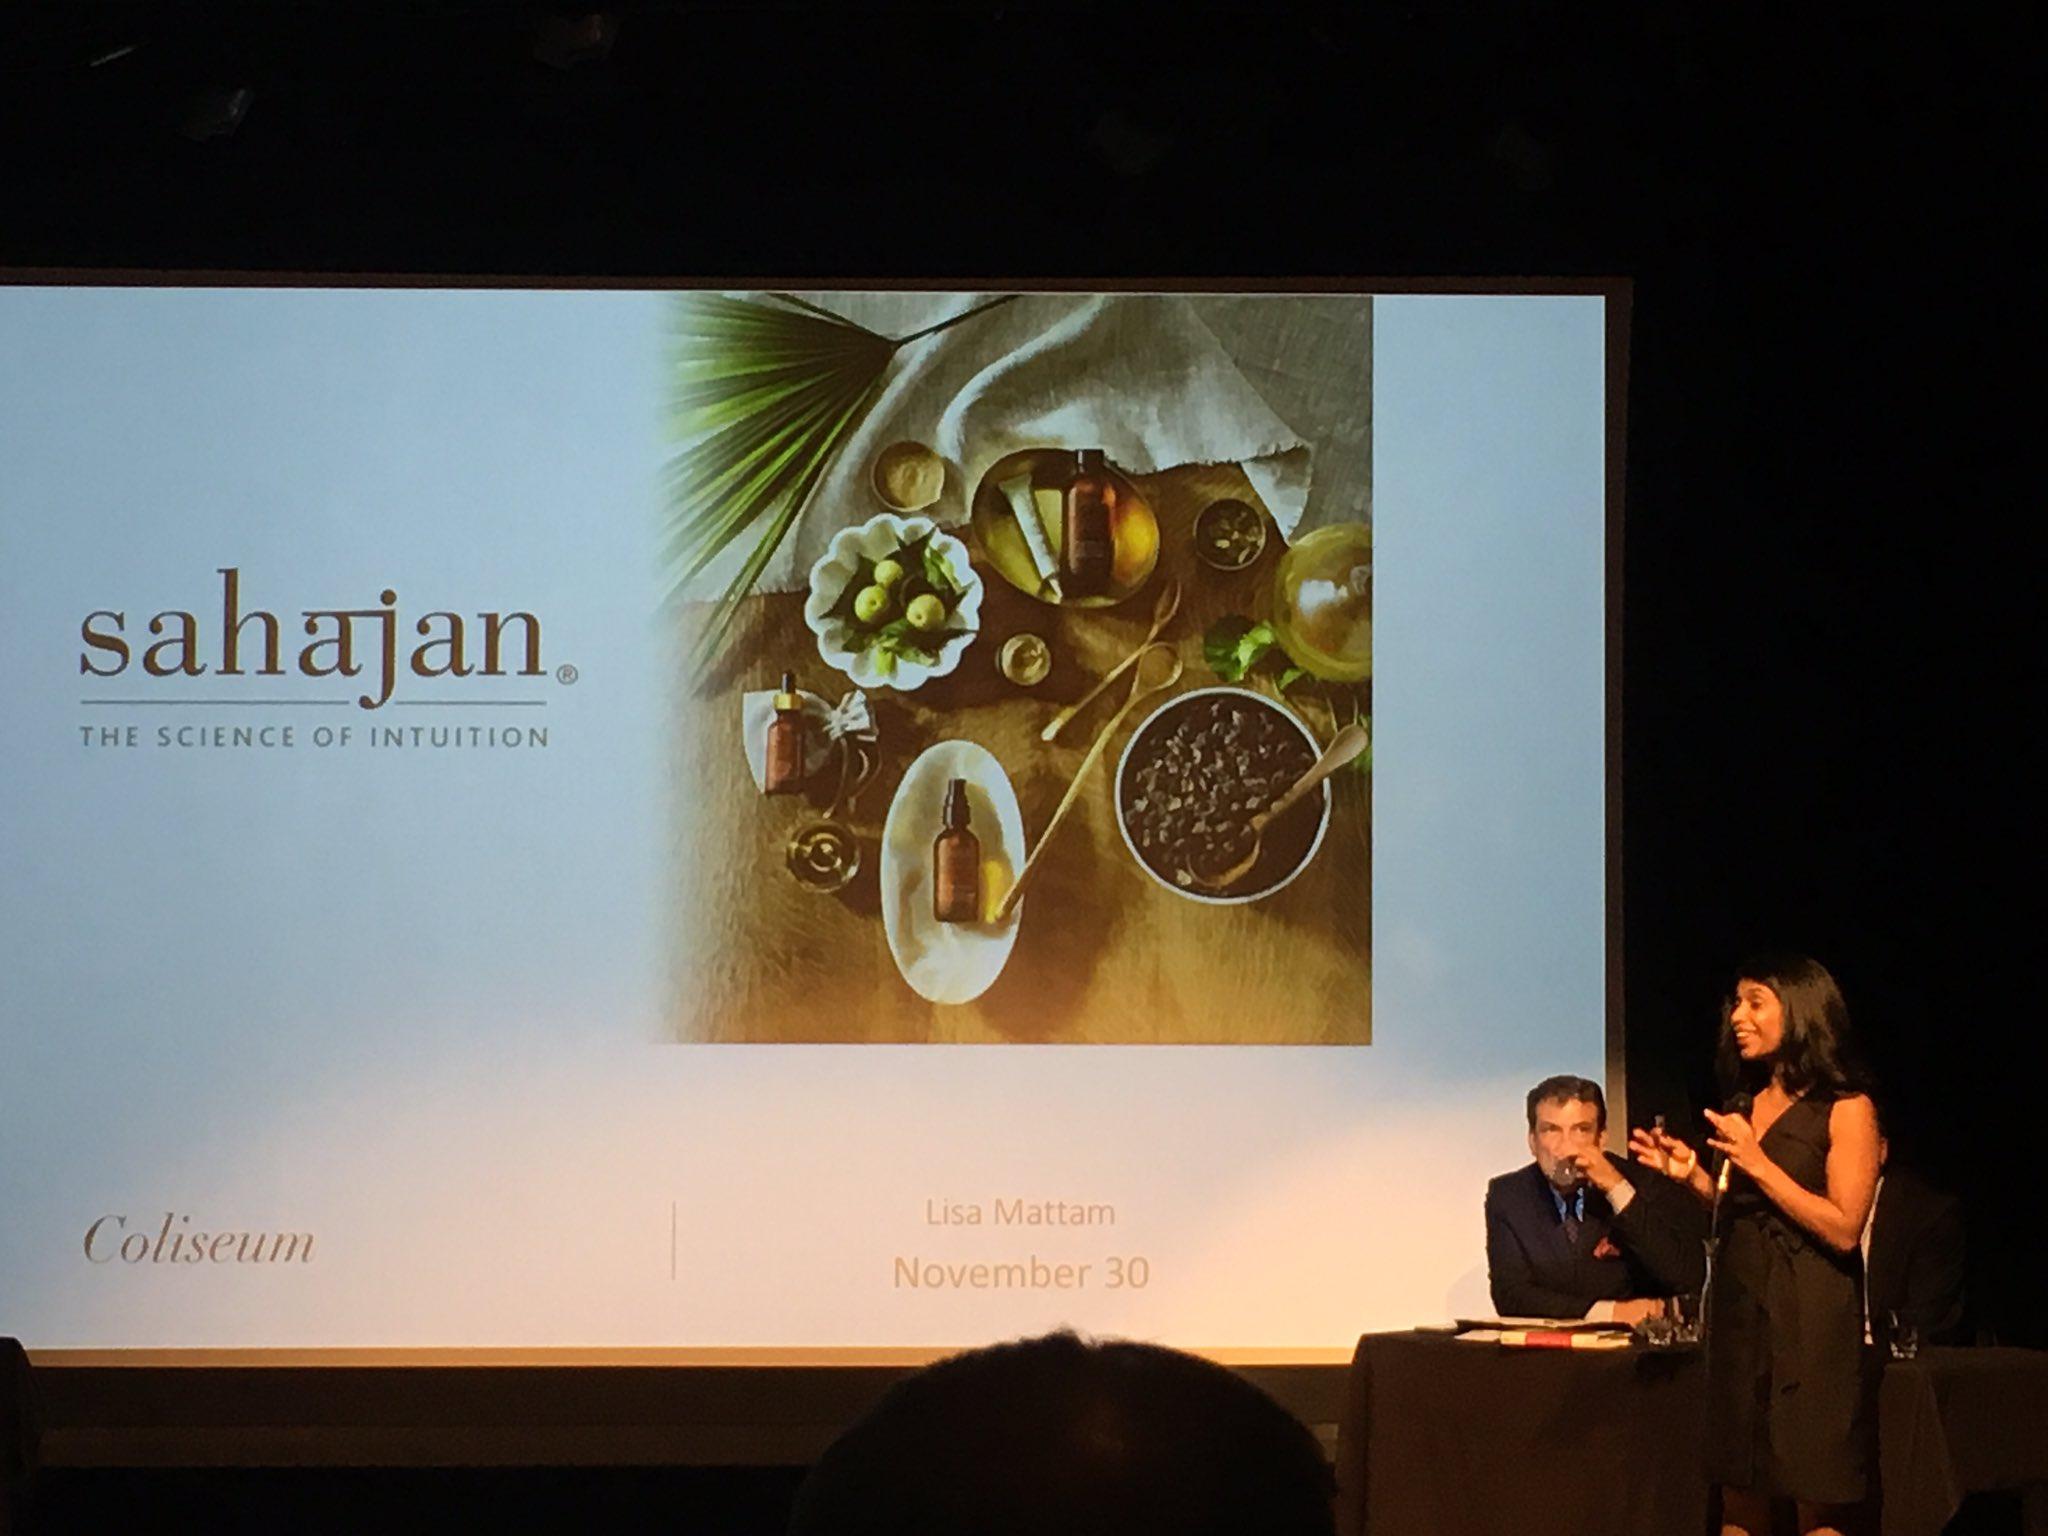 Founder of @sahajanskincare starts her pitch at  #Coliseum2016 @aagefontario 📍#entrepreneurship #toronto https://t.co/gRgcwY0sd3